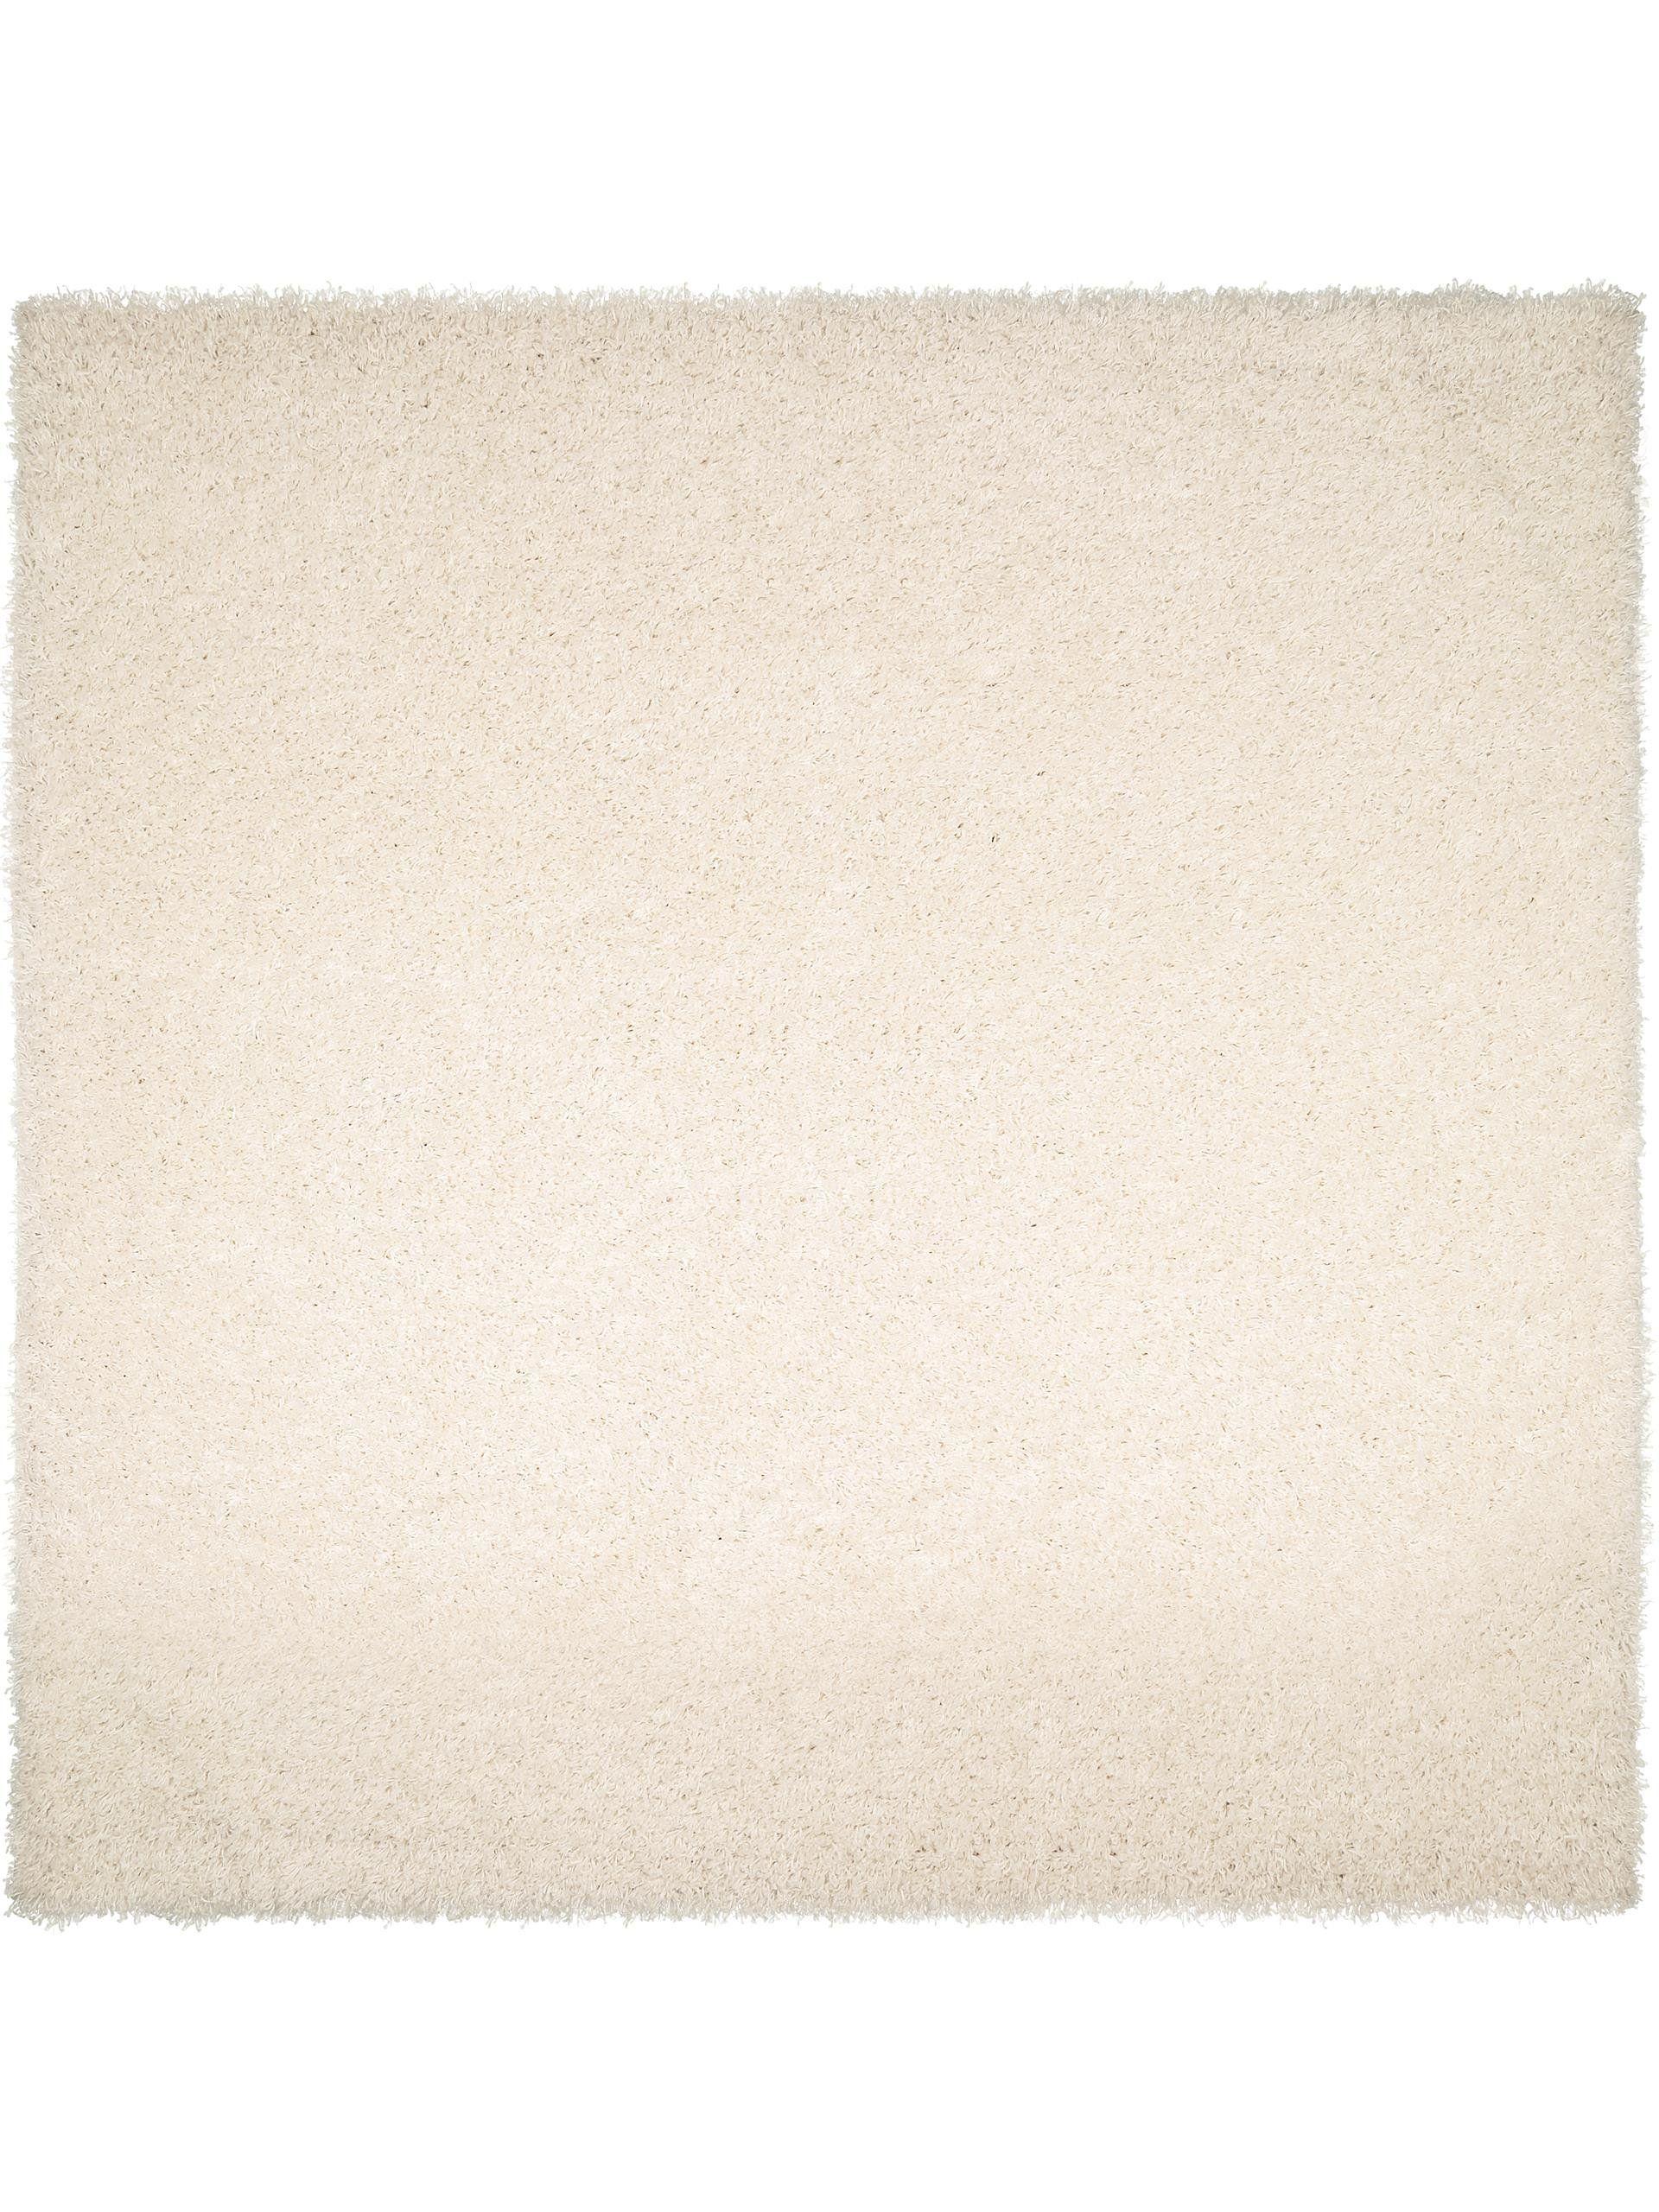 Tapis Long Poil Blanc enuta tapis shaggy à poils longs / longues mèches blanc